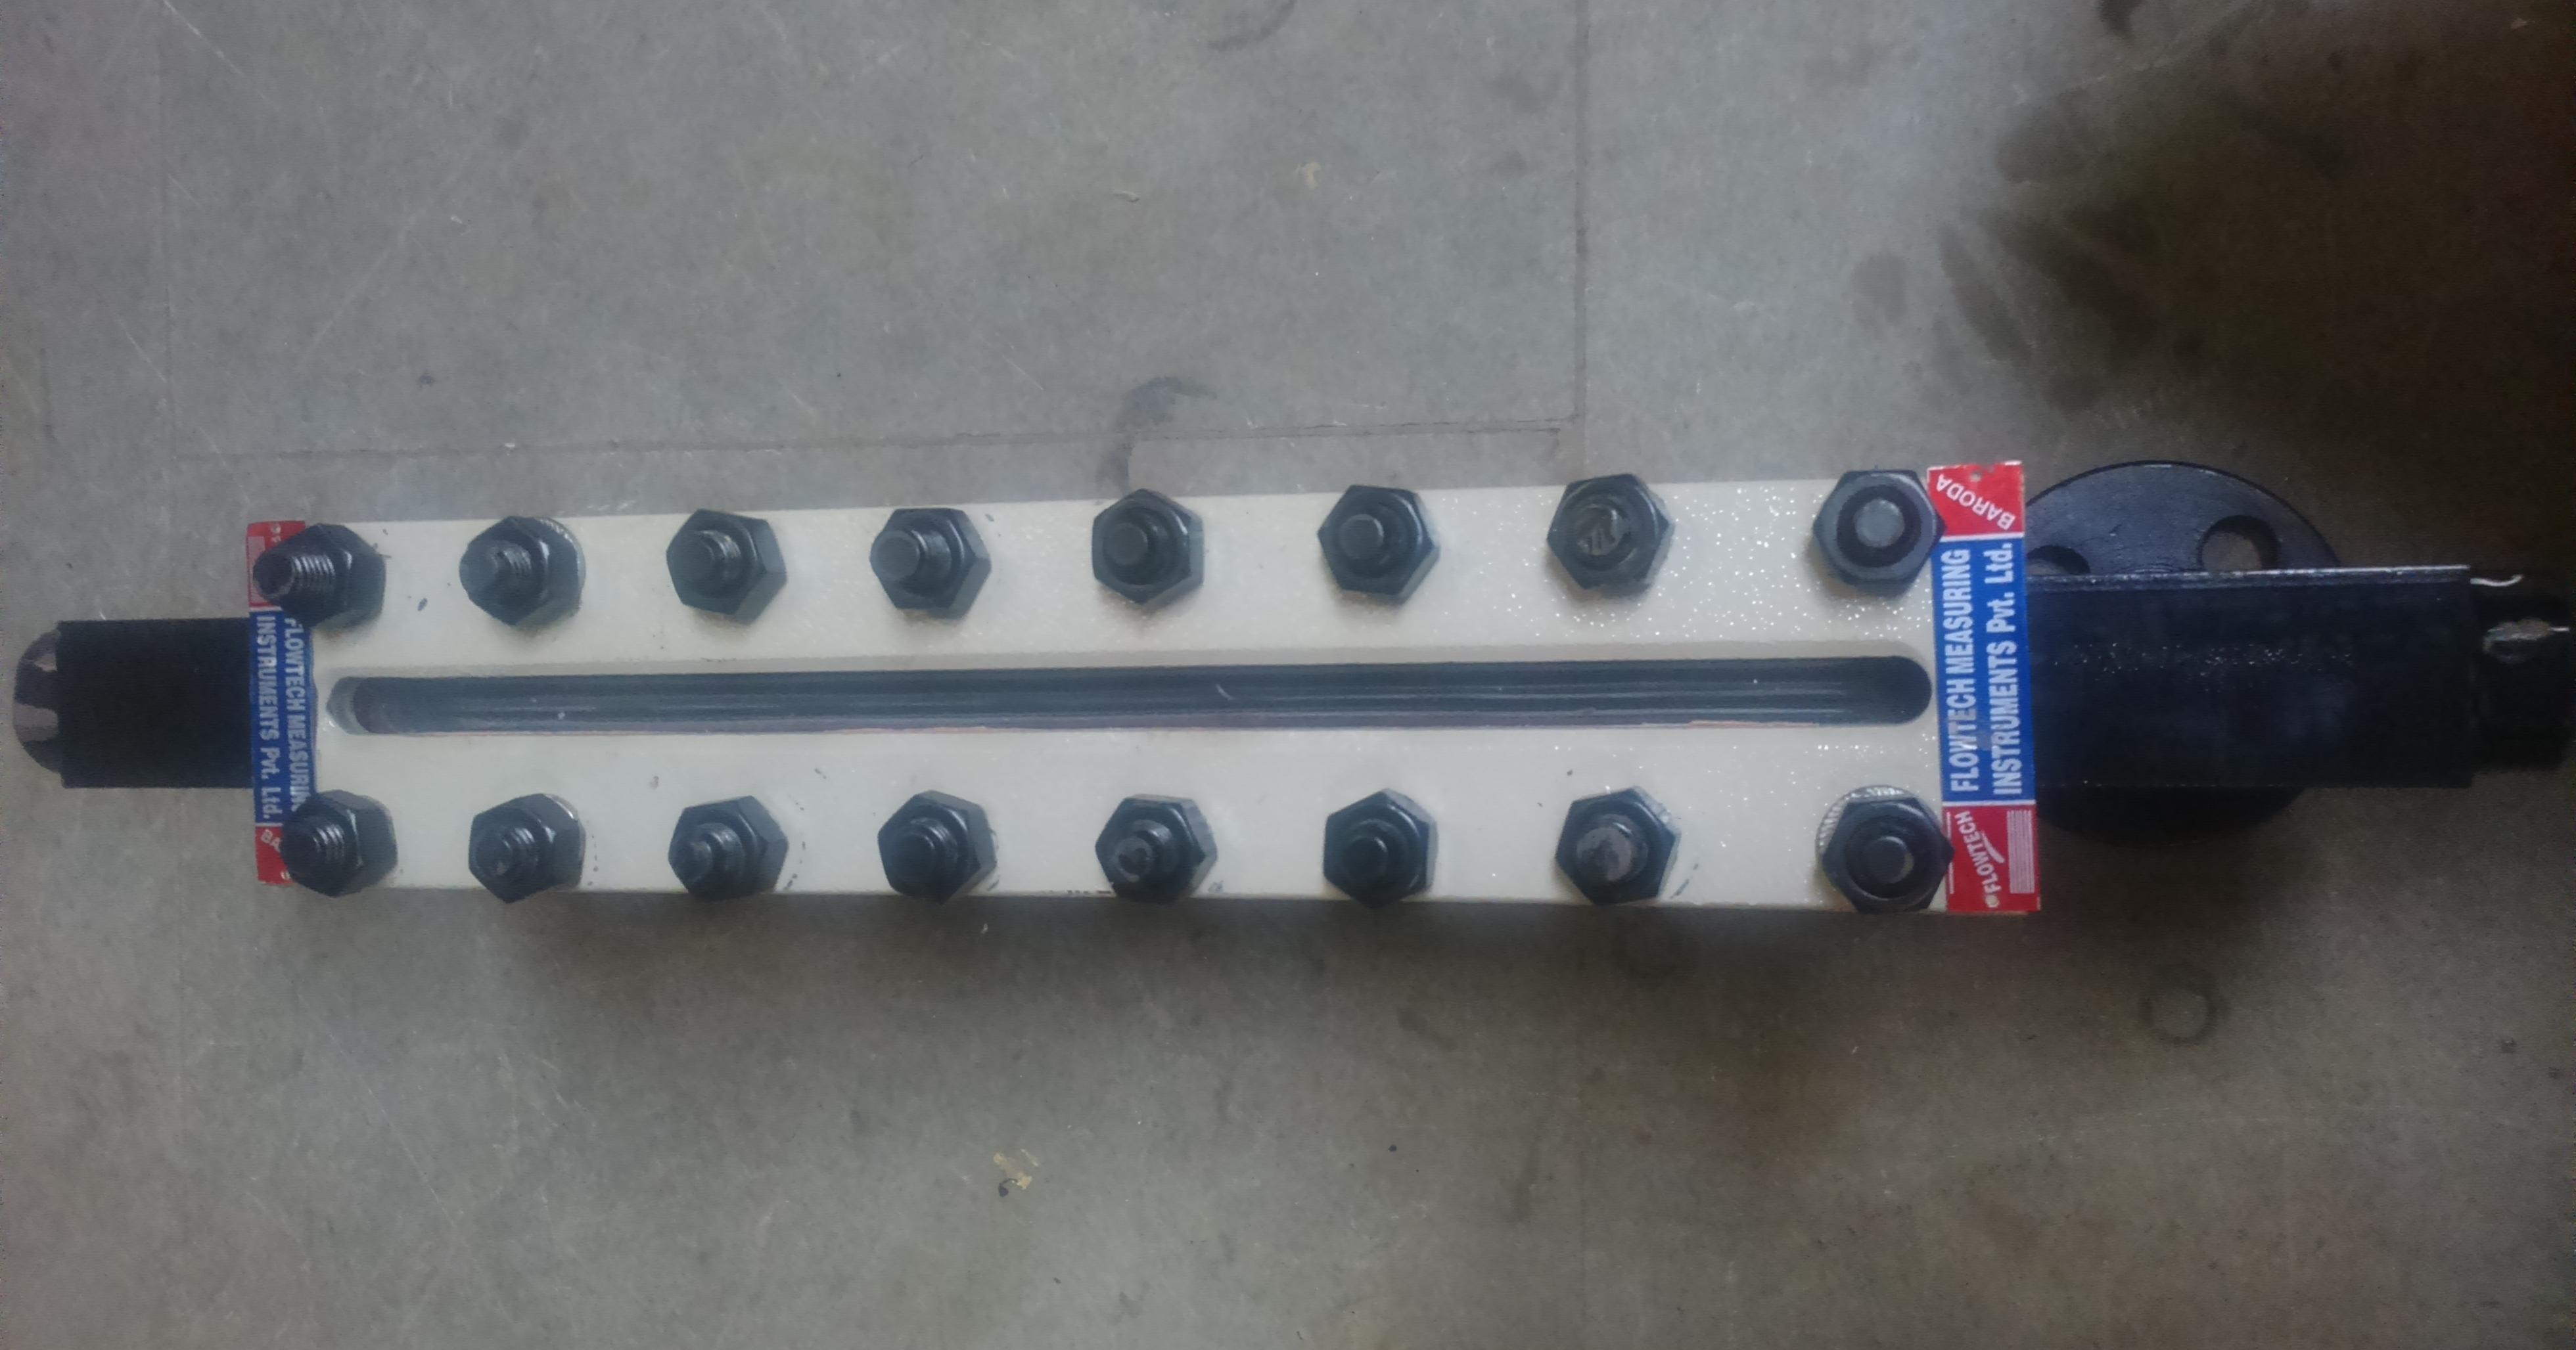 Reflex Level Indicator